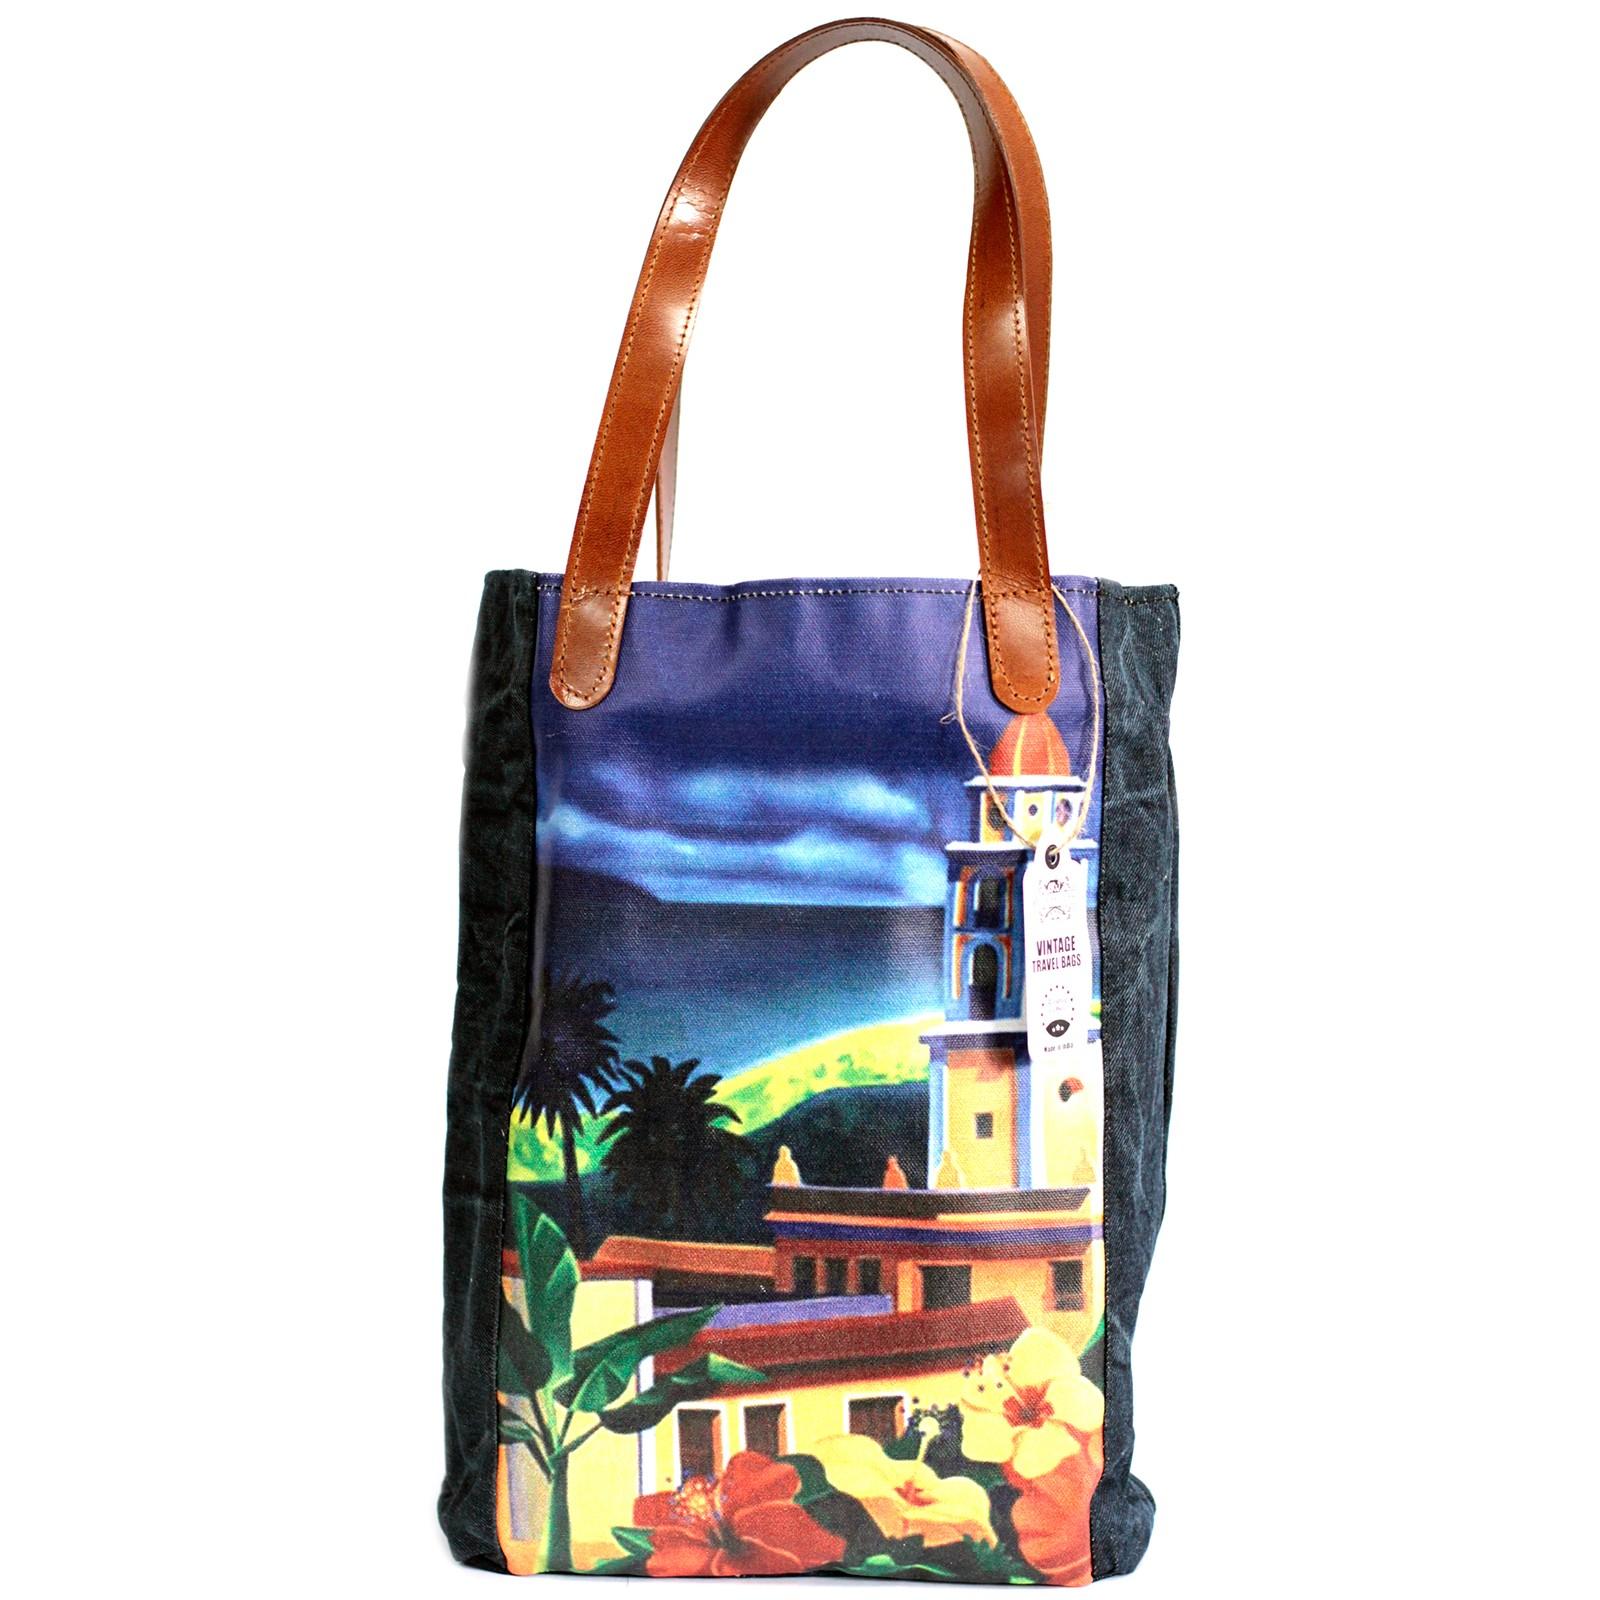 Vintage Travel Bag - Cuba